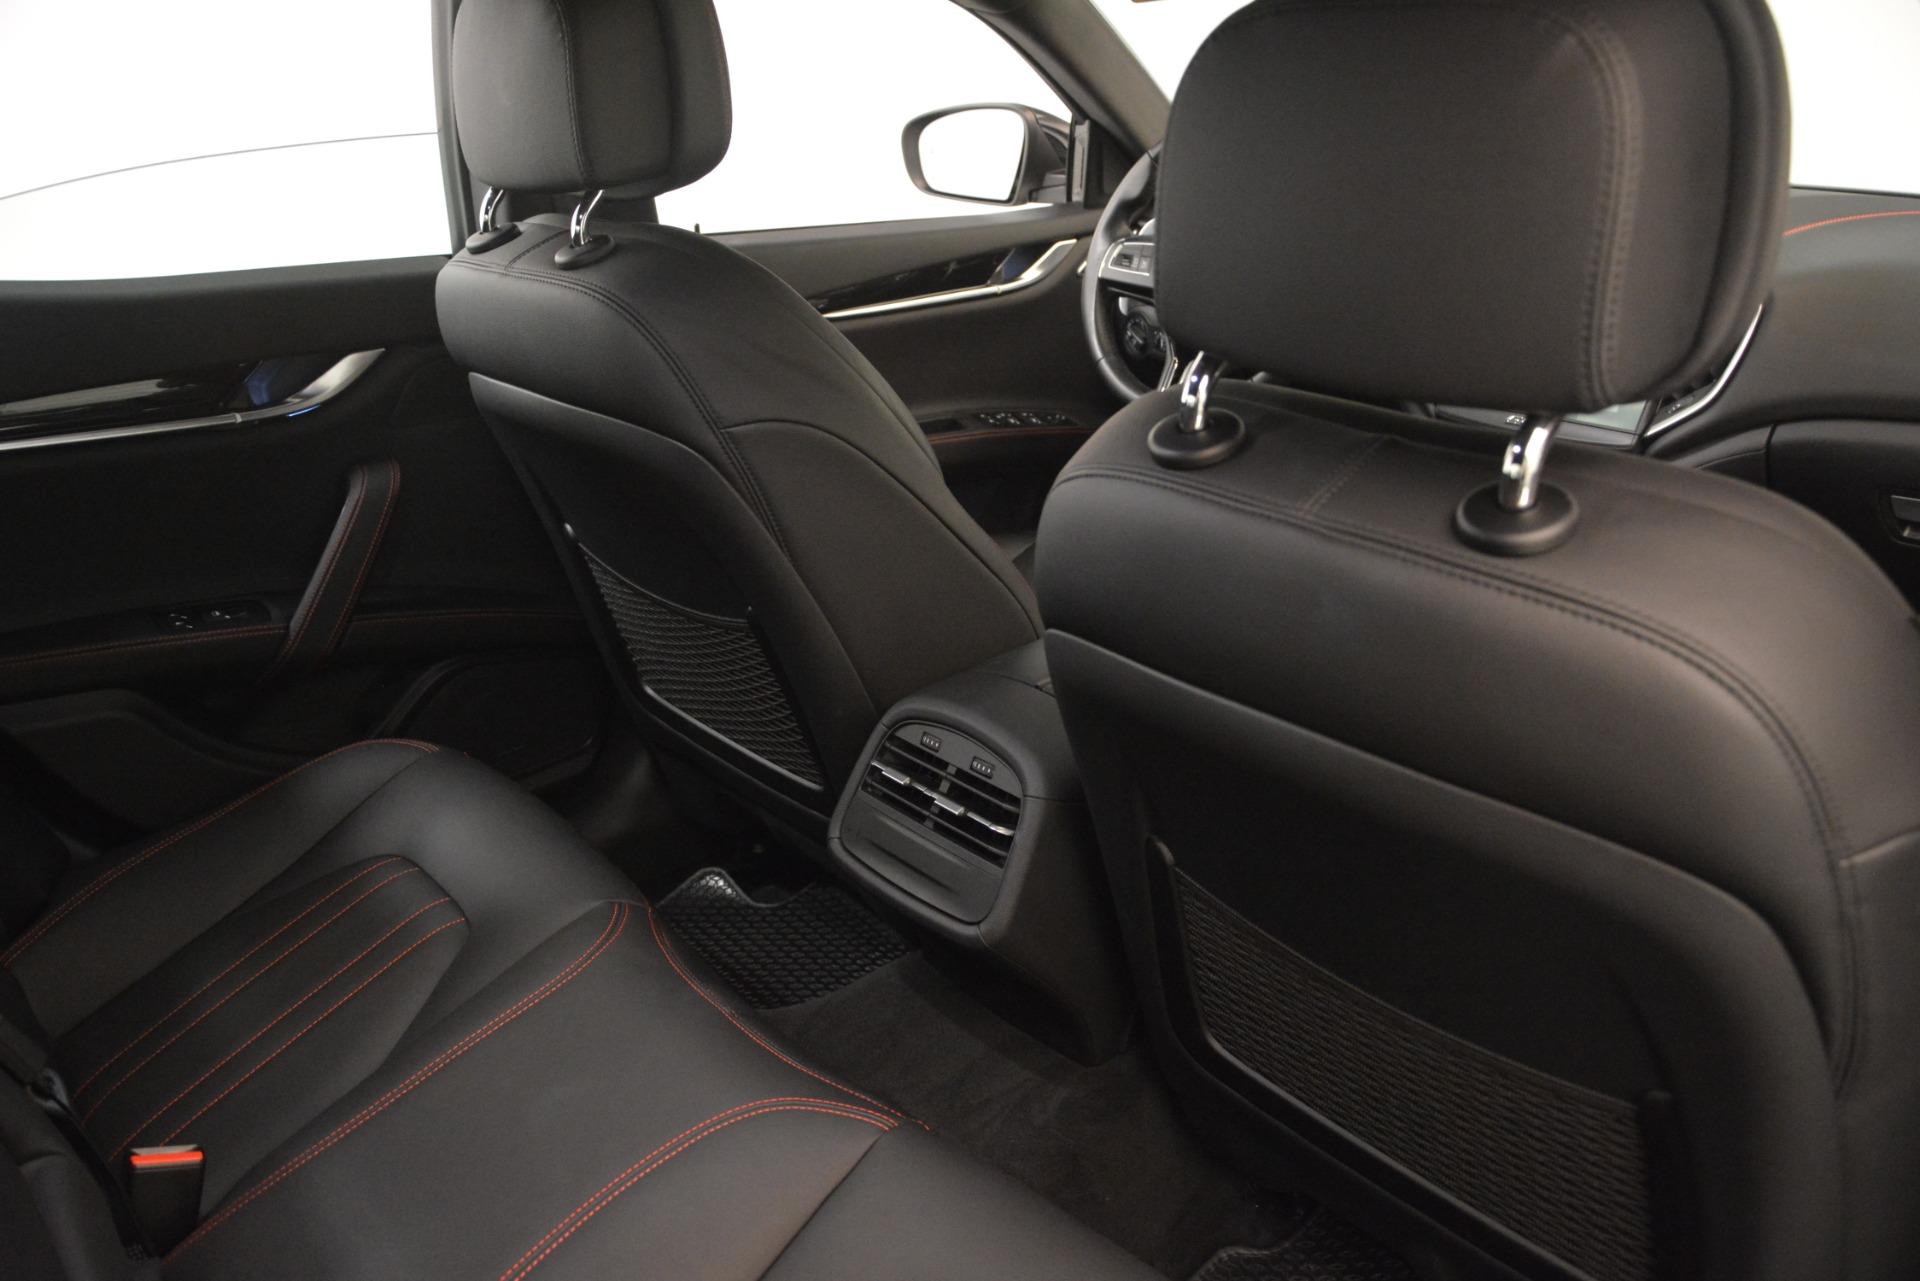 Used 2018 Maserati Ghibli S Q4 For Sale In Greenwich, CT 1772_p22